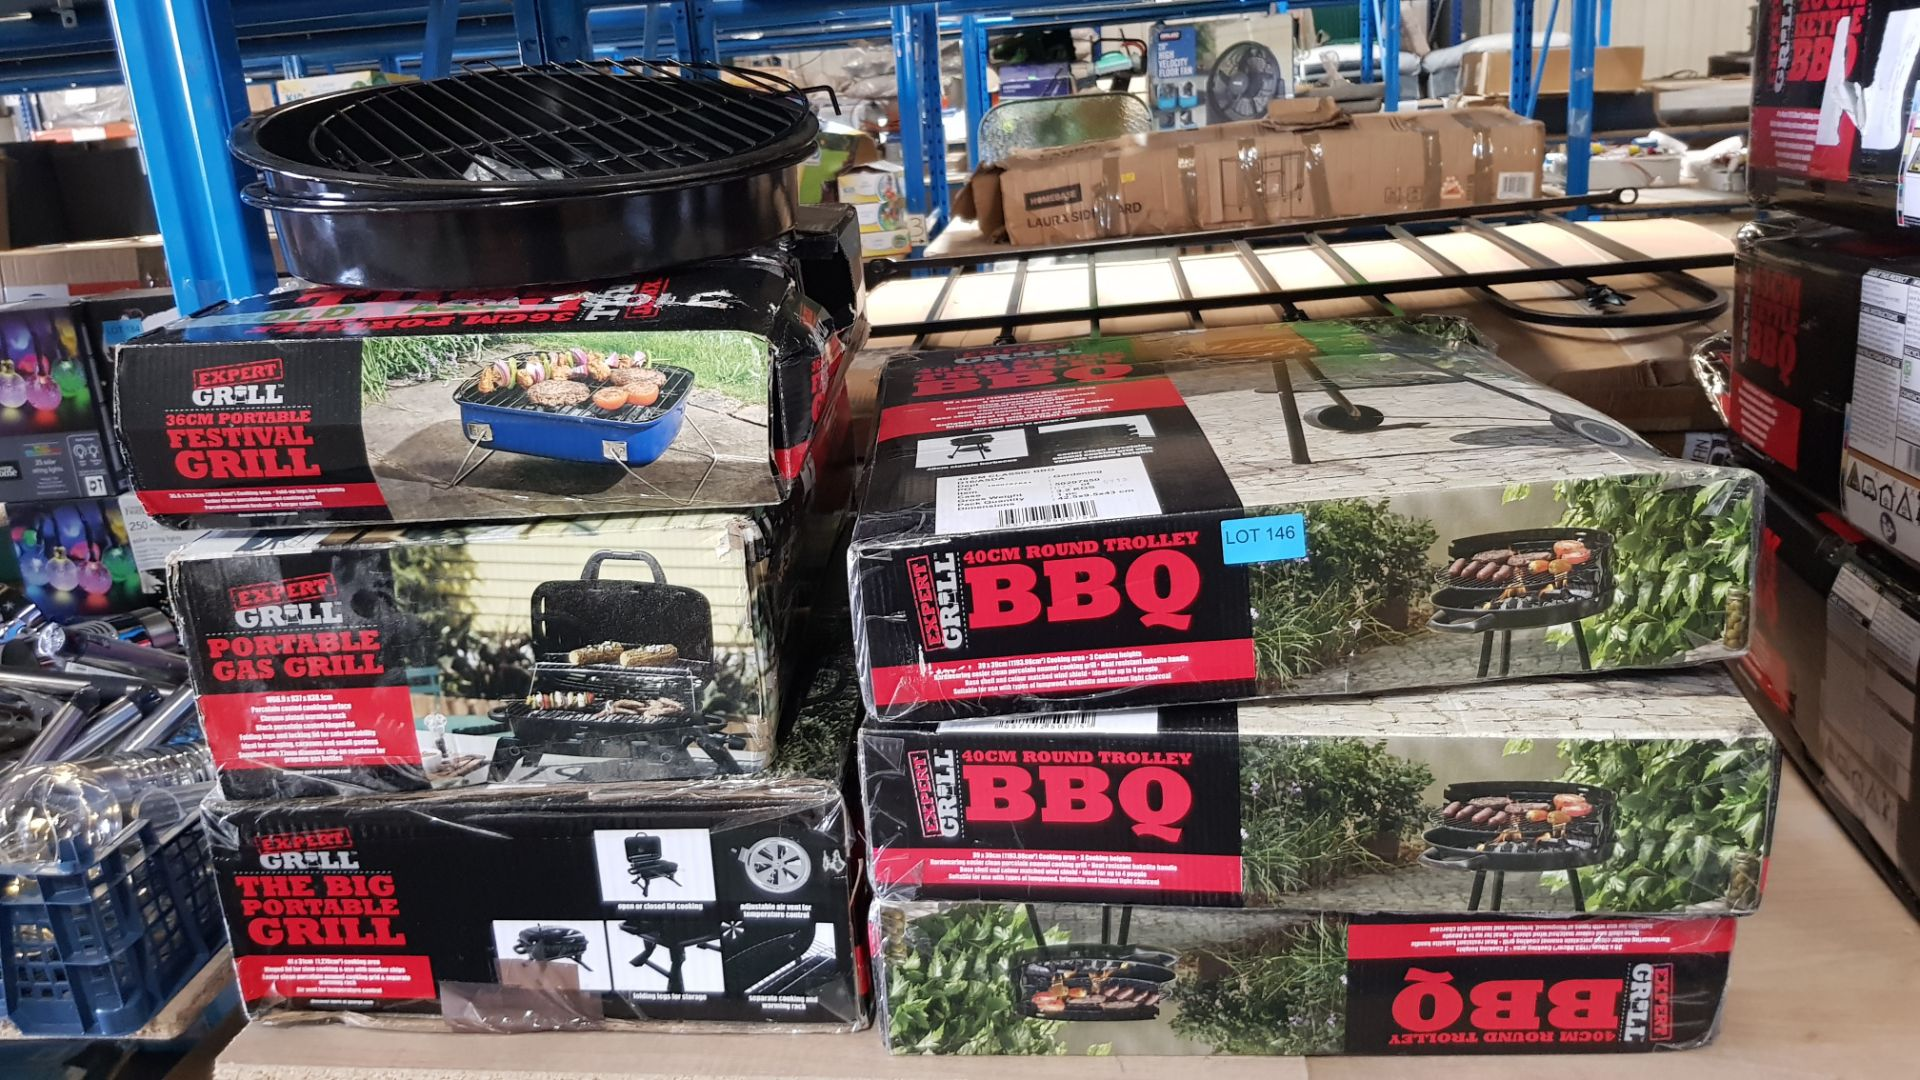 (3F) 8x Expert Grill BBQ Items. 3X 40cm Round Trolly BBQ. 1x The Big Portable Grill. 1x Portable Ga - Image 4 of 4